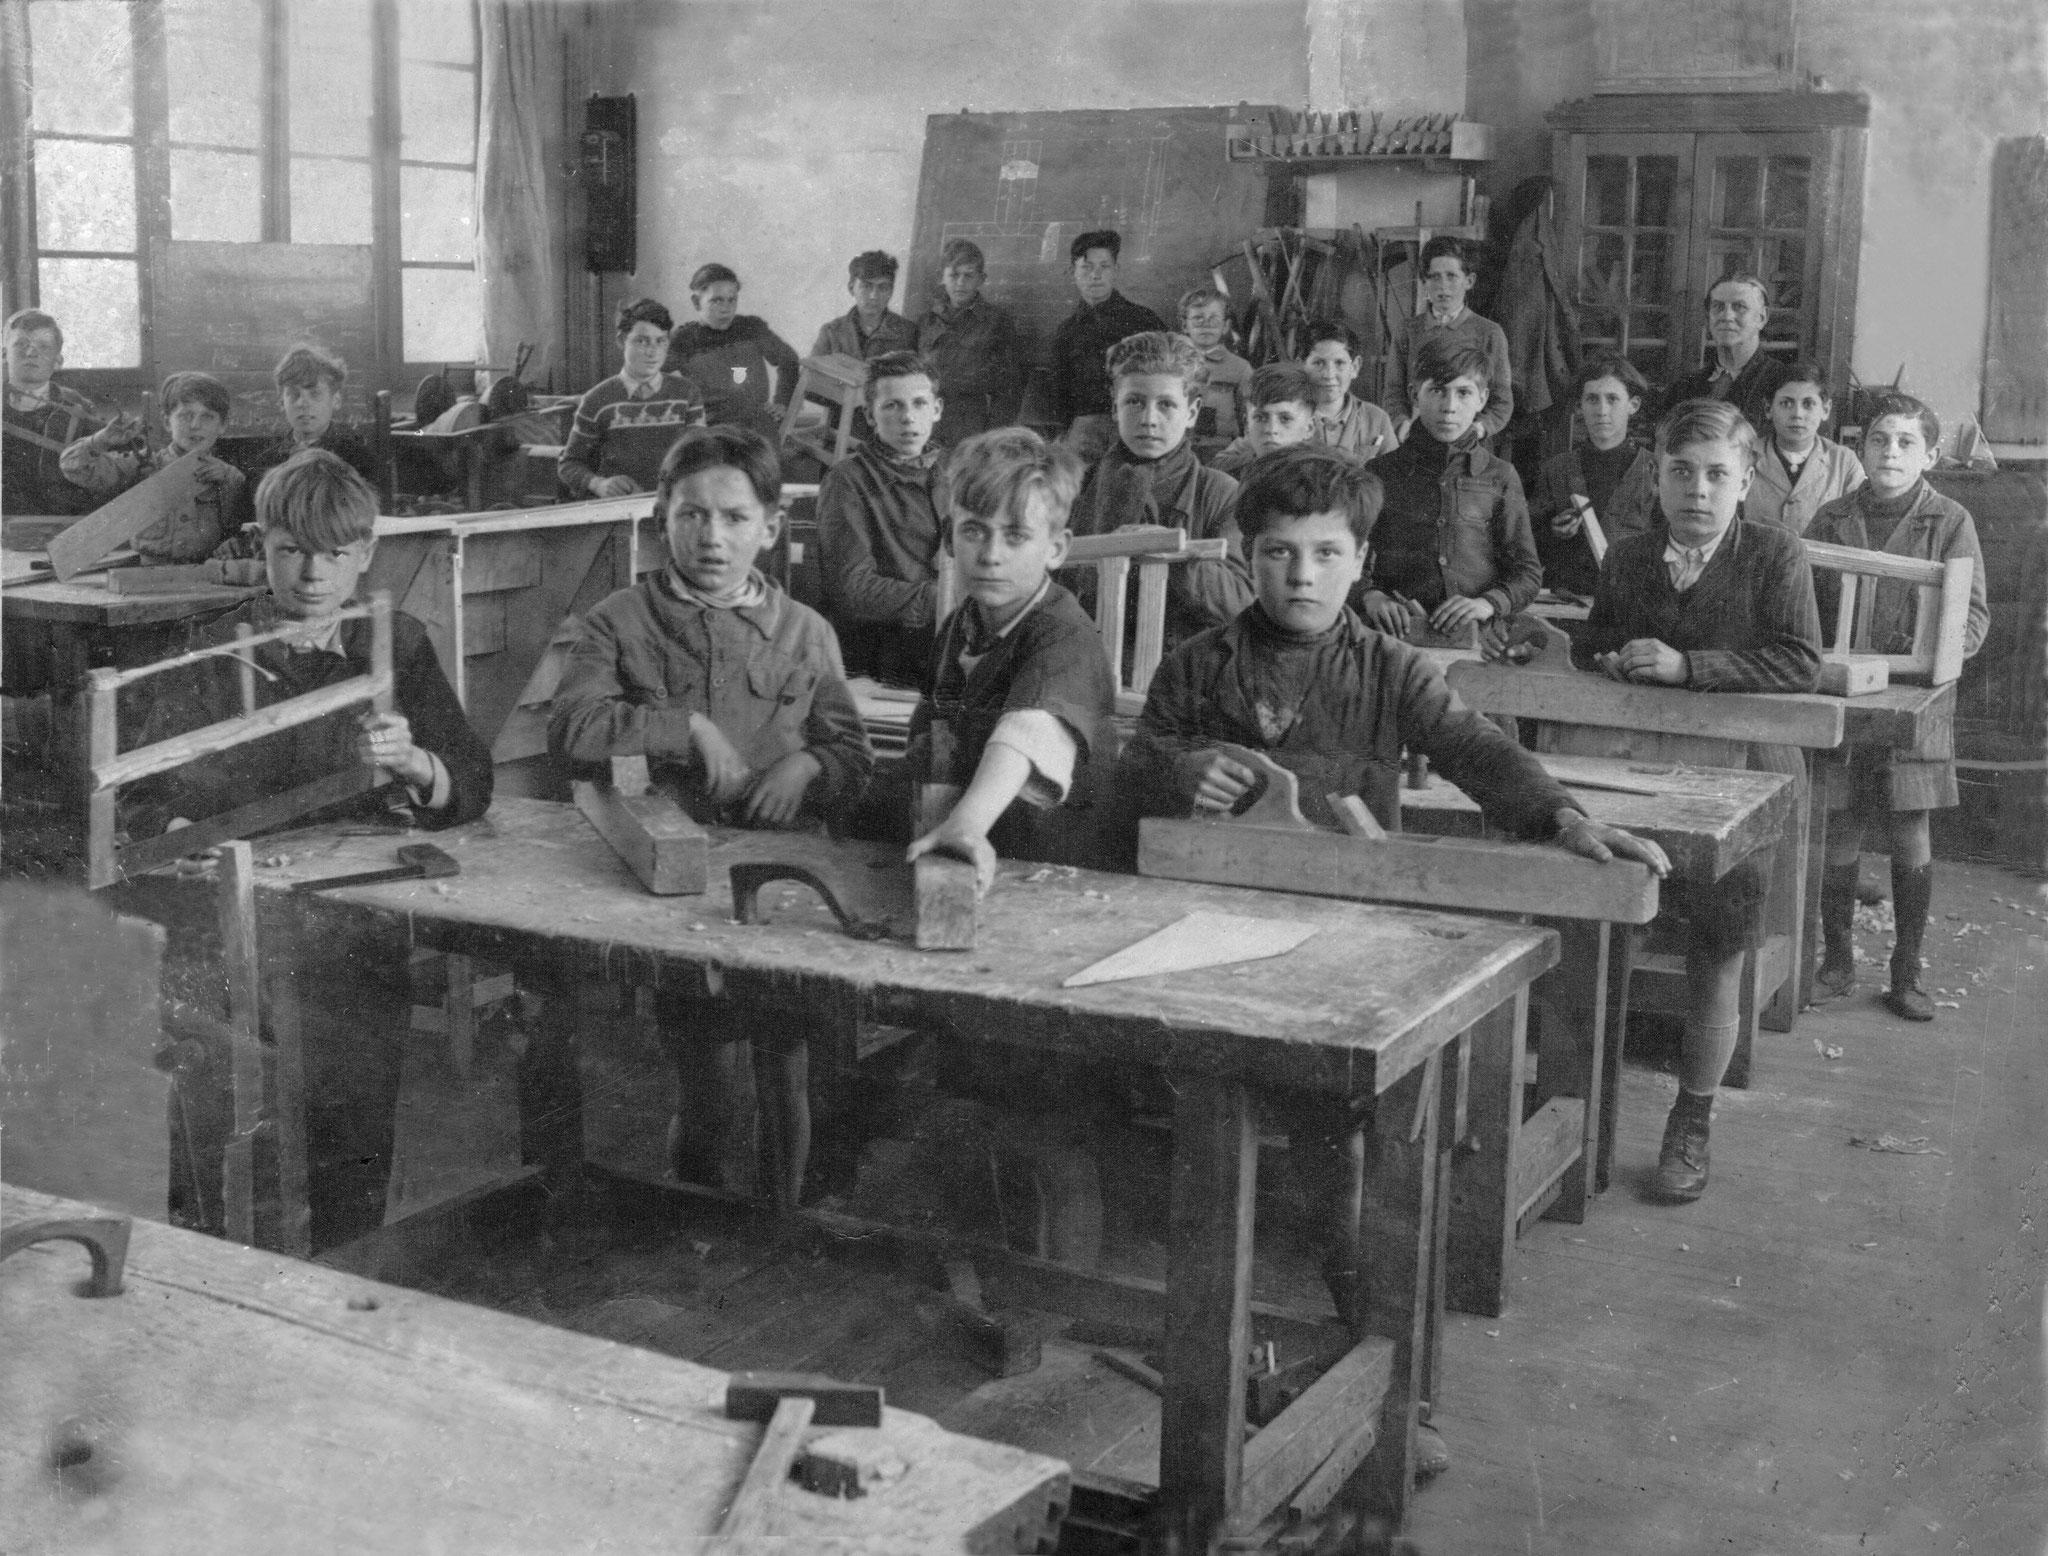 Lanois classe bois vers 1940